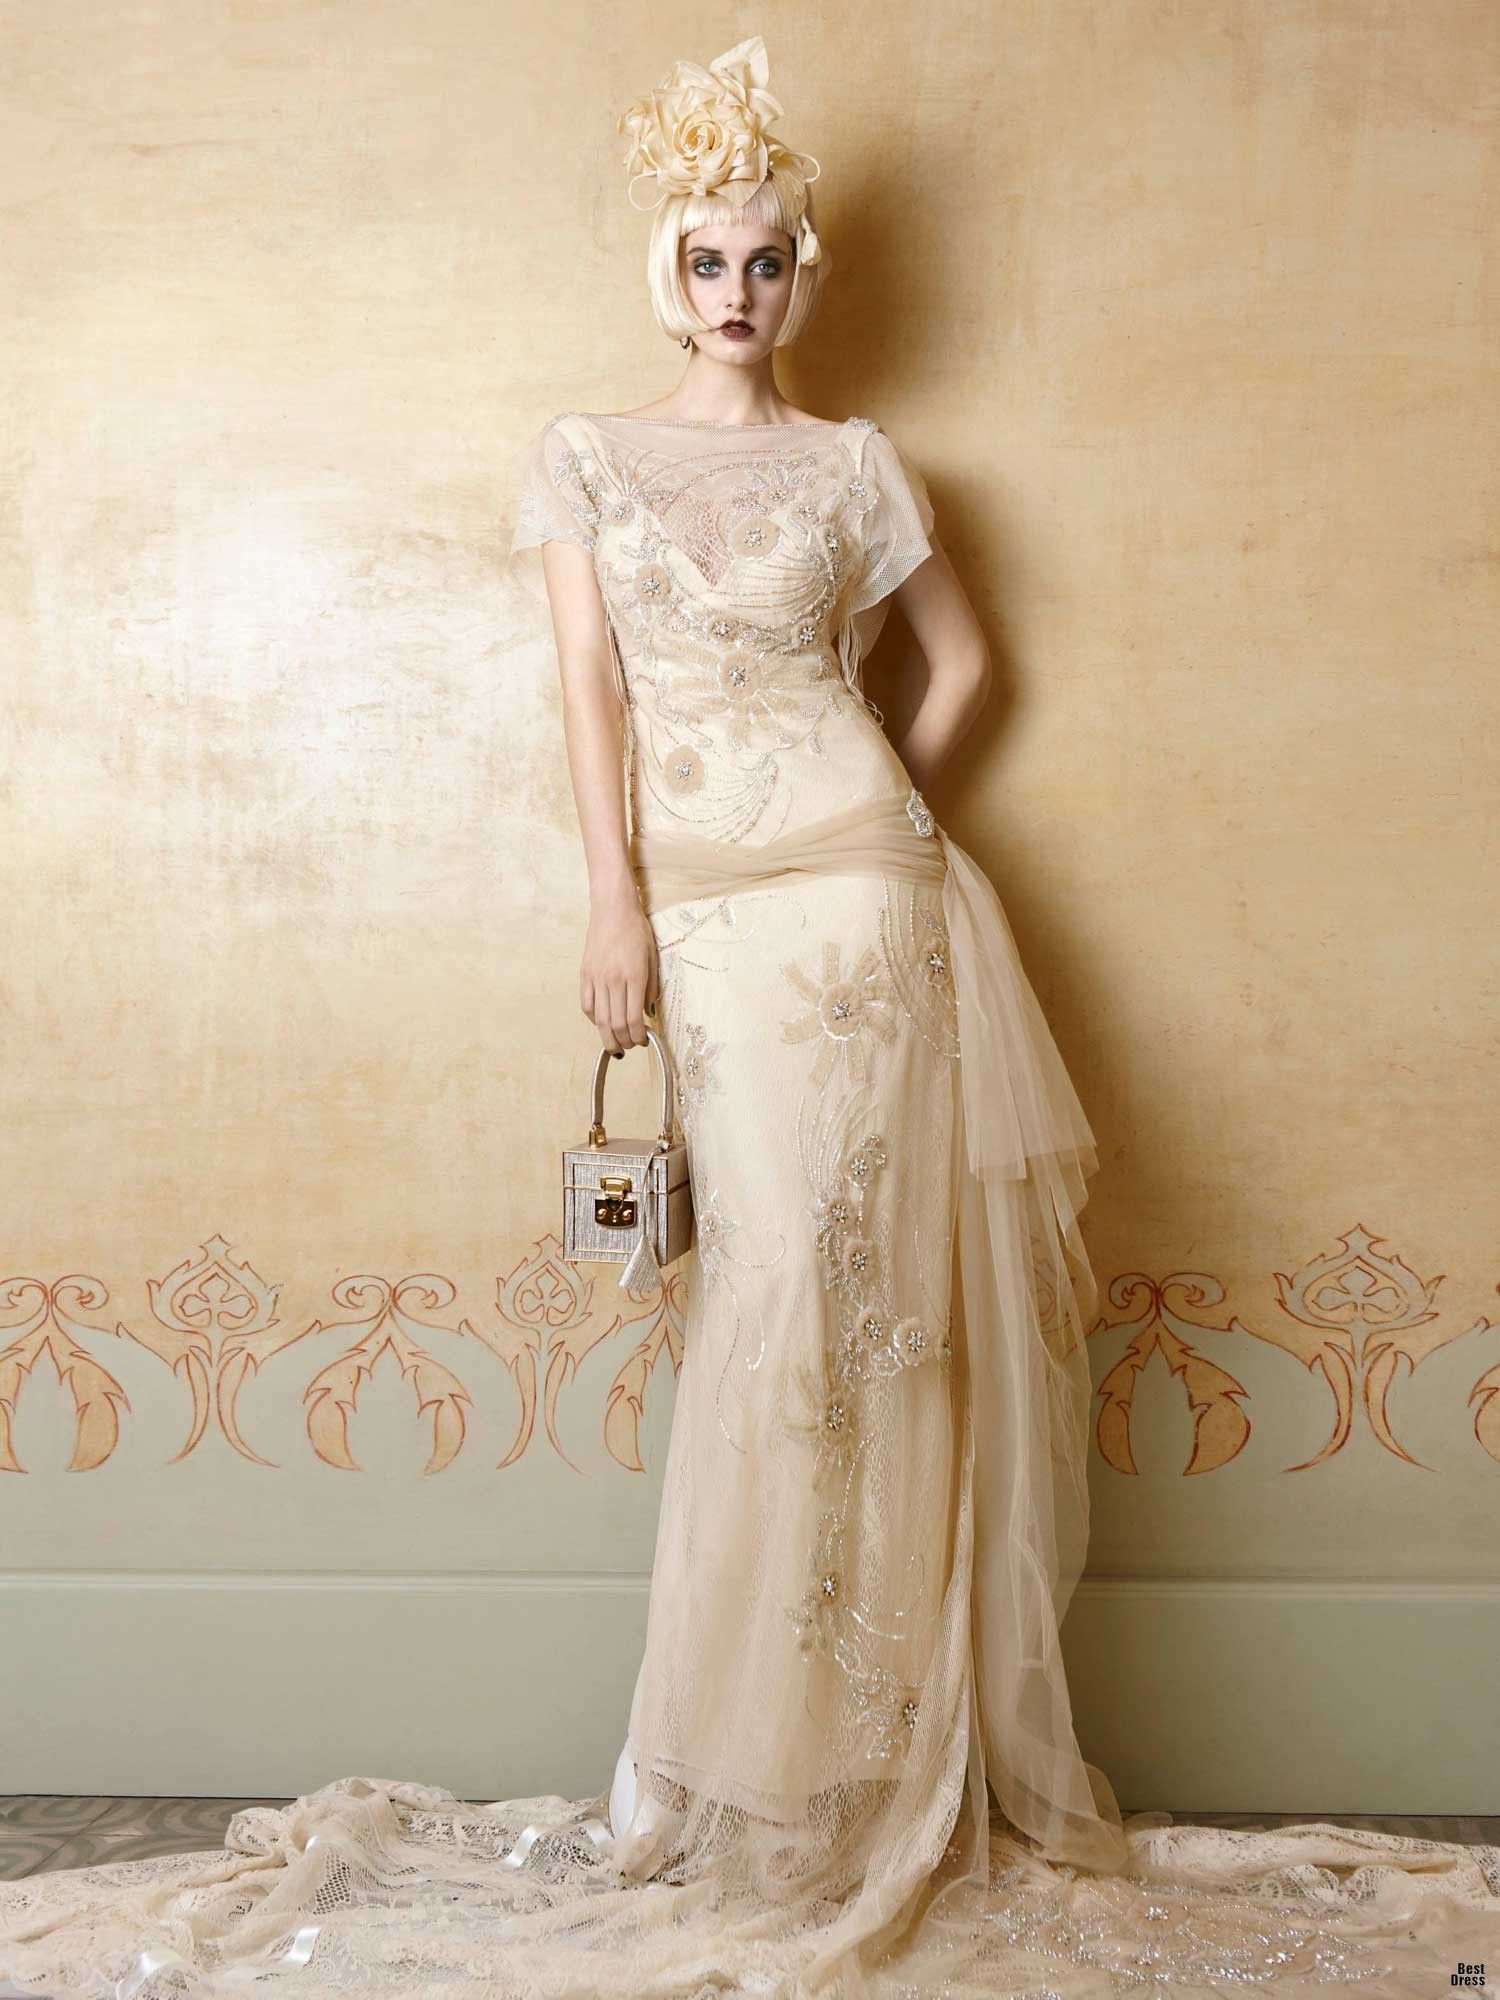 Yolancris mademoiselle vintage bestdress cайт о платьях